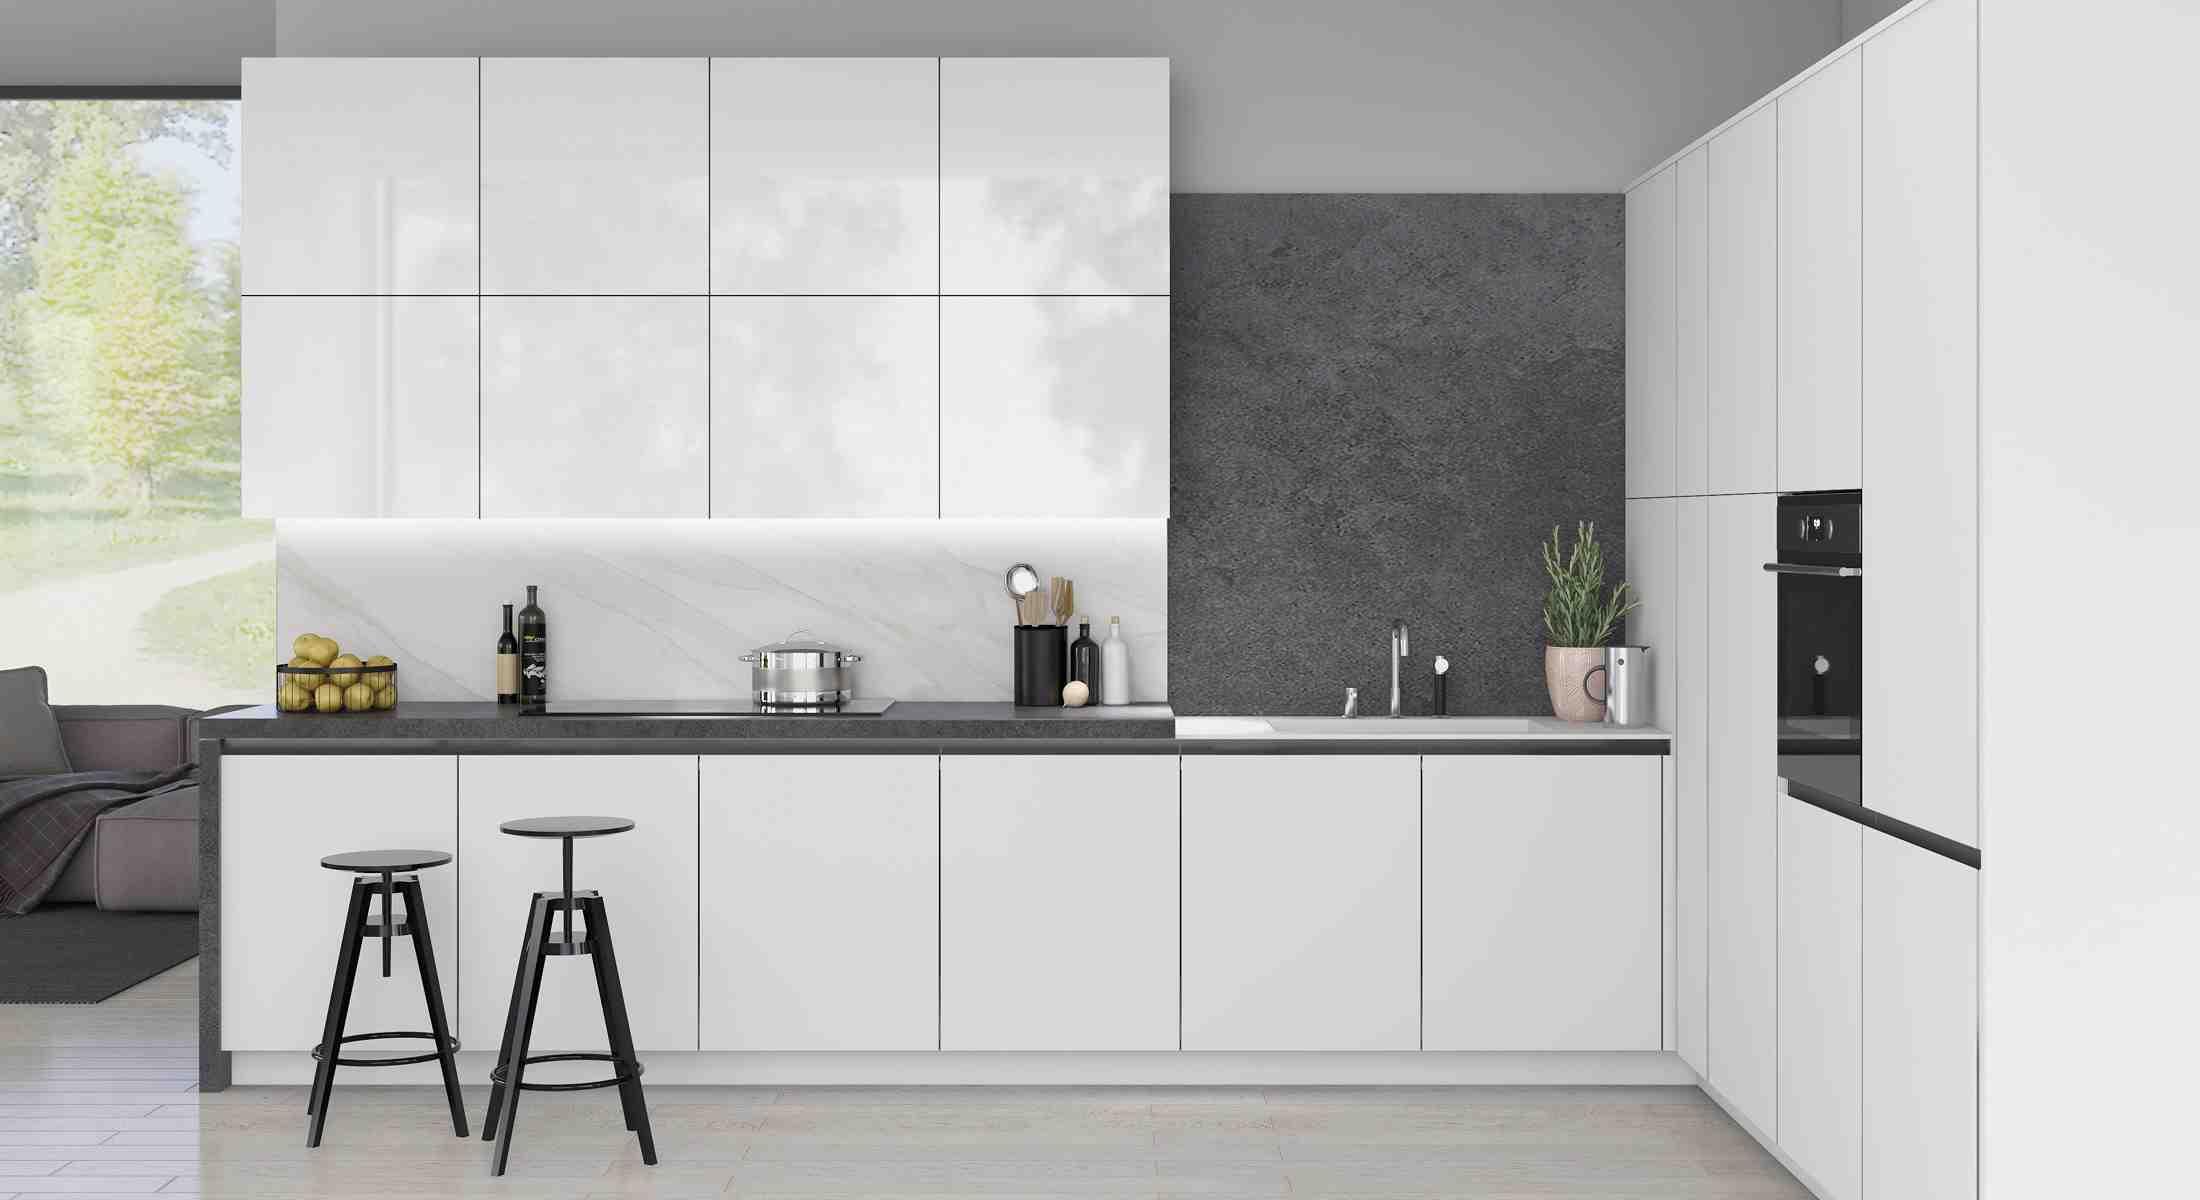 kitchens in burryport, wales by steve williams - vassa gloss - true handleless